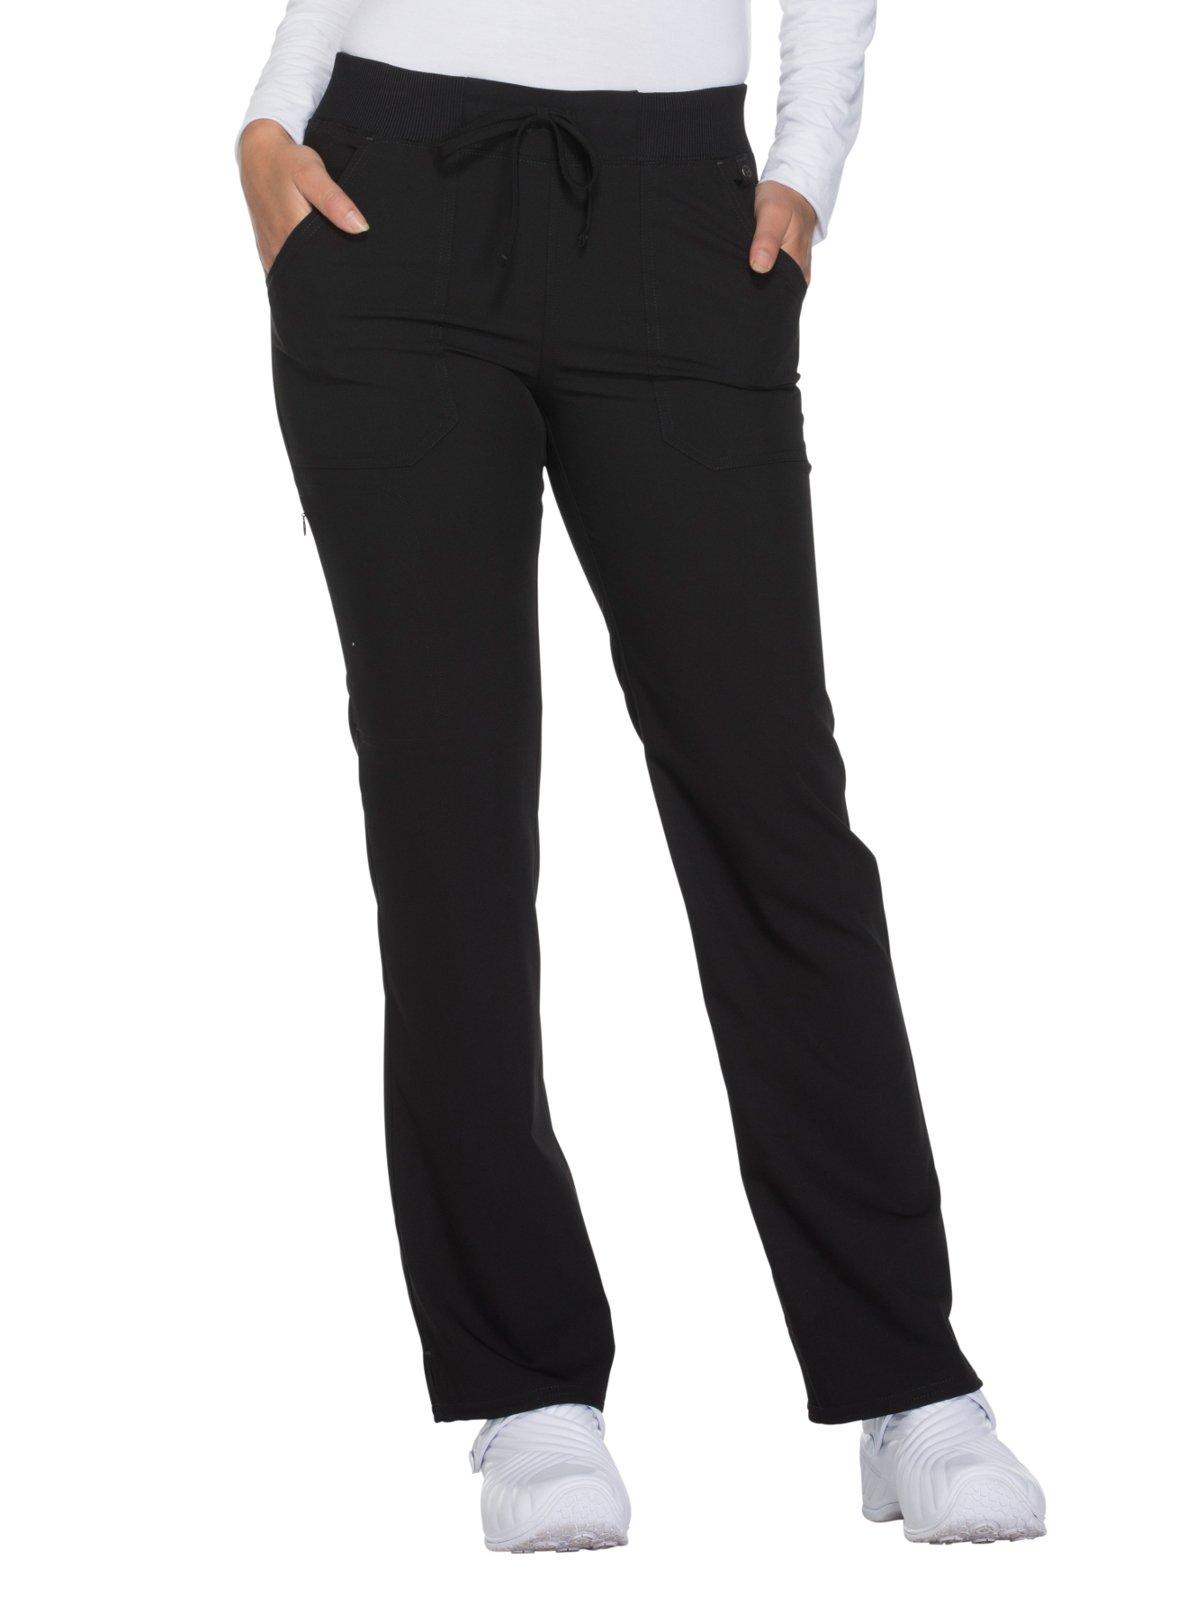 Dickies Xtreme Stretch Women's Drawstring Straight Leg Scrub Pant X-Large Tall Black